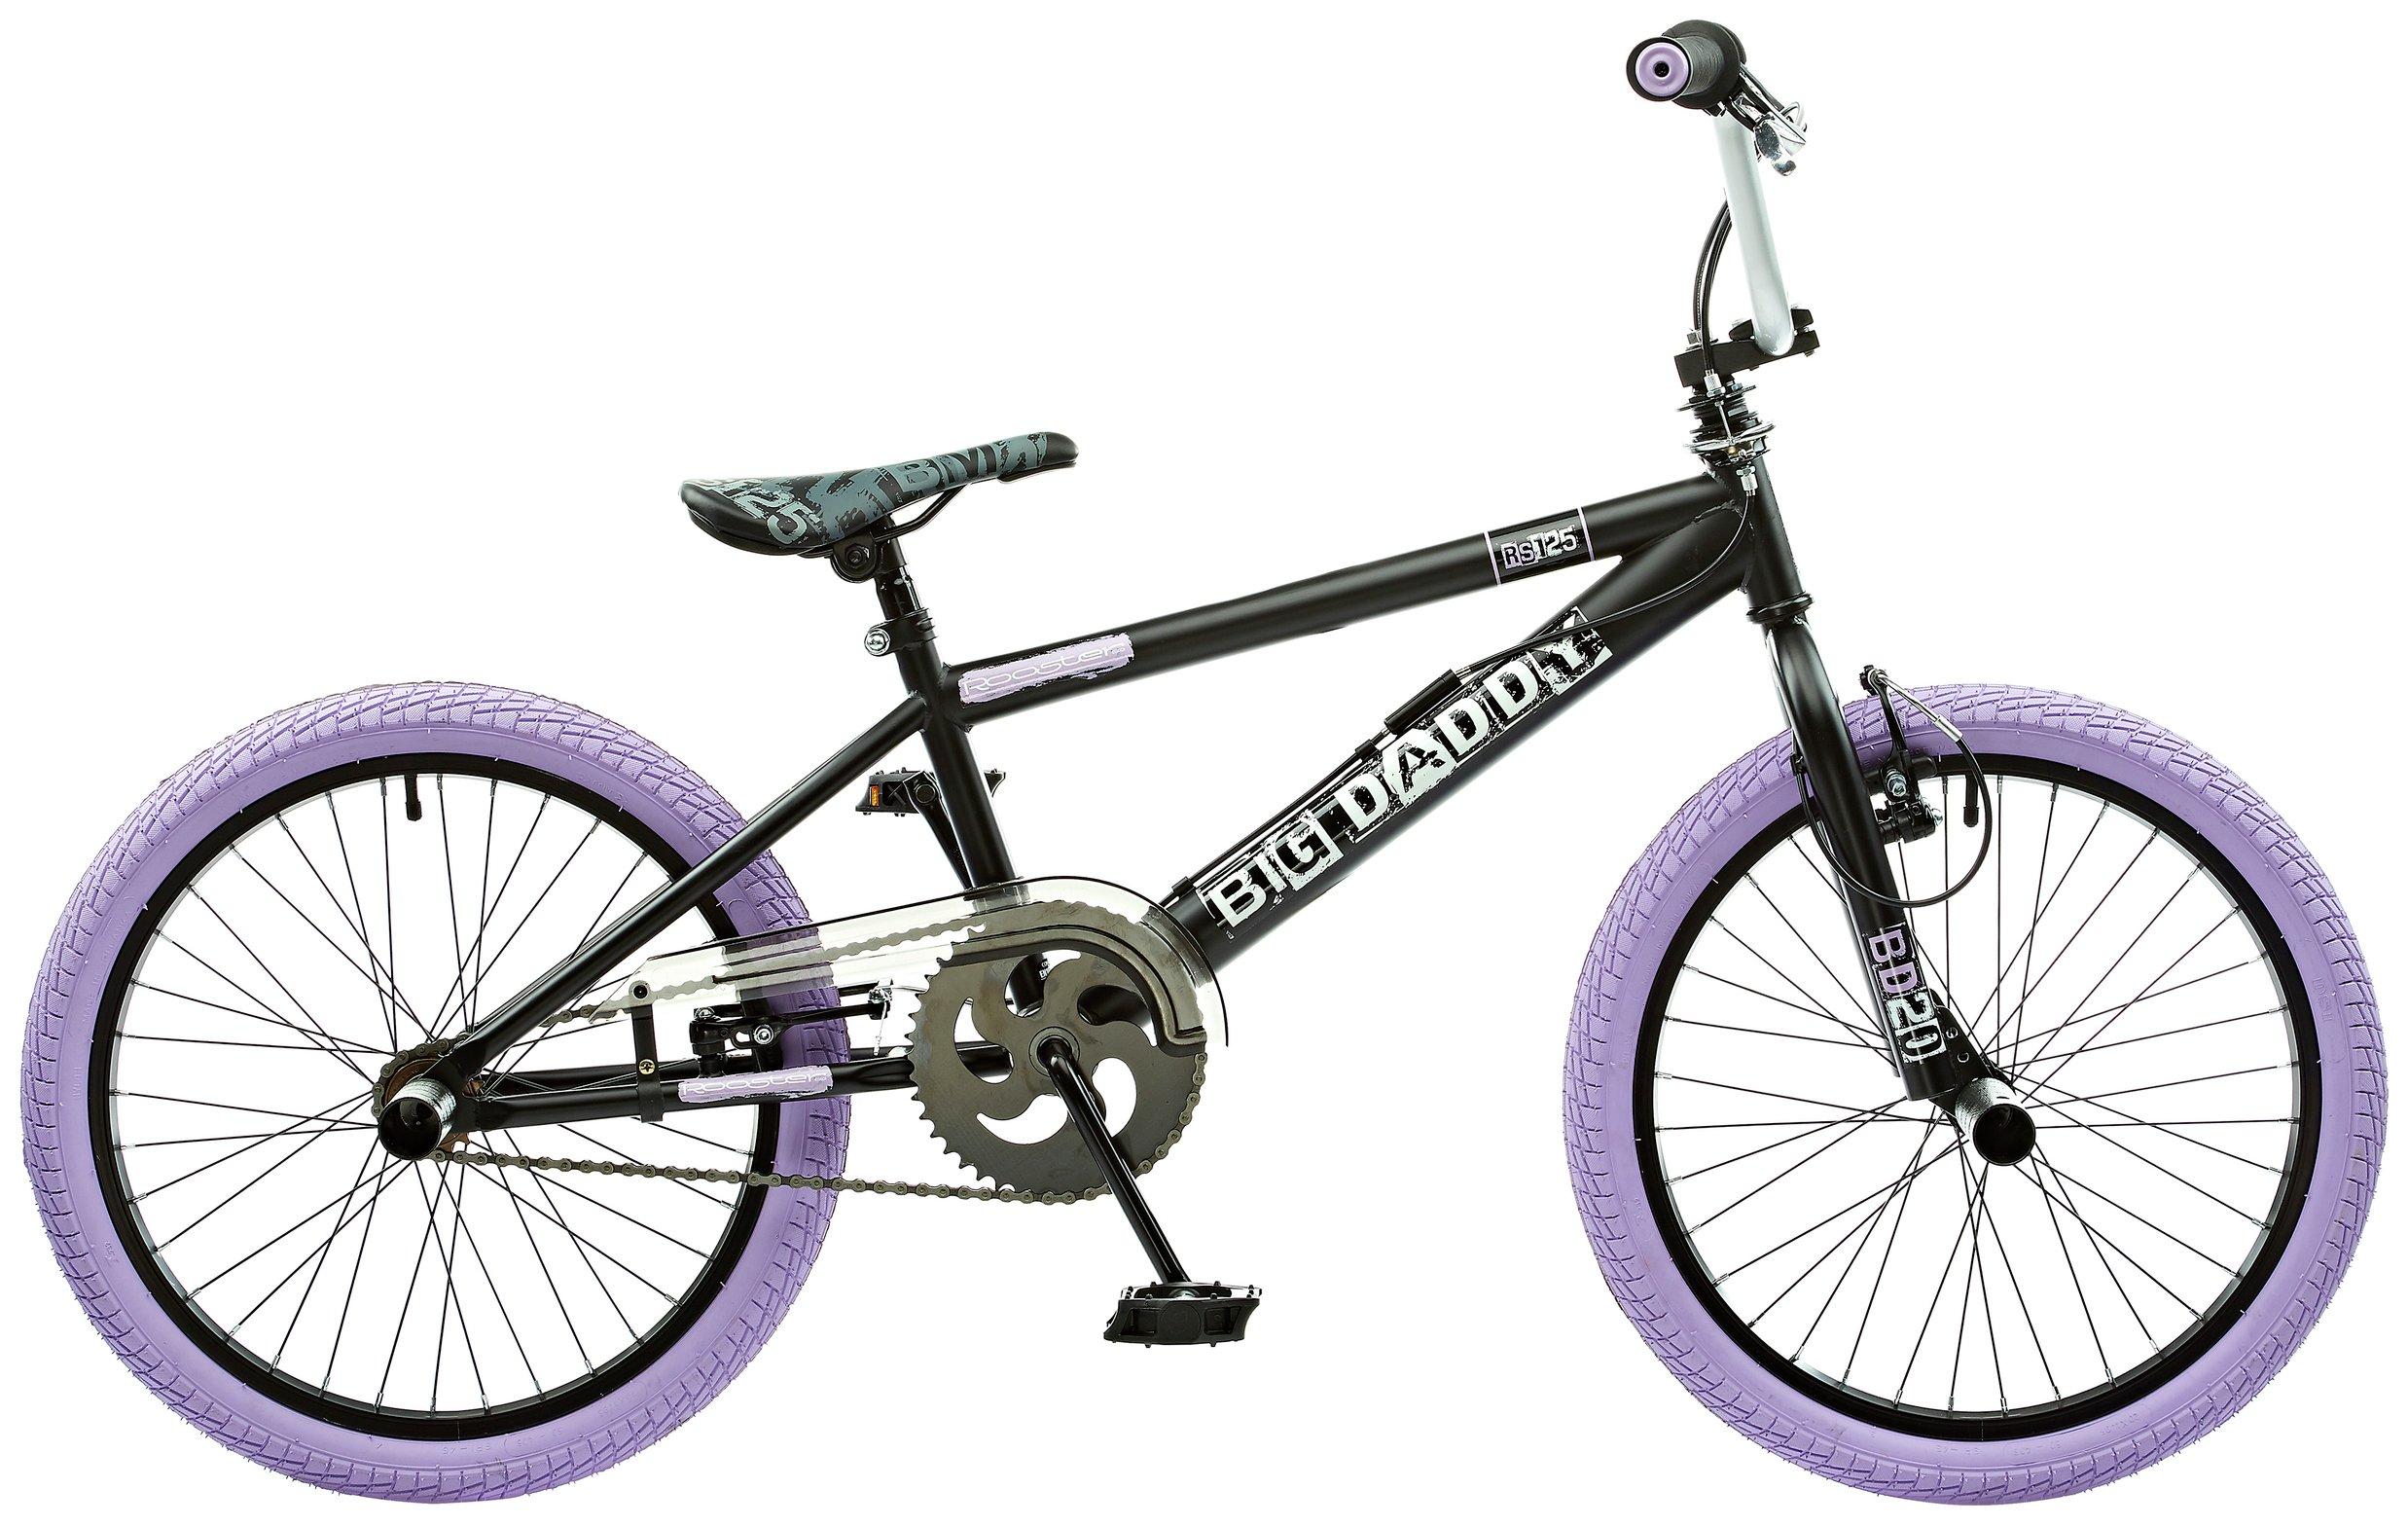 'Rooster Big Daddy 20 Bmx Bike - Black & Lilac